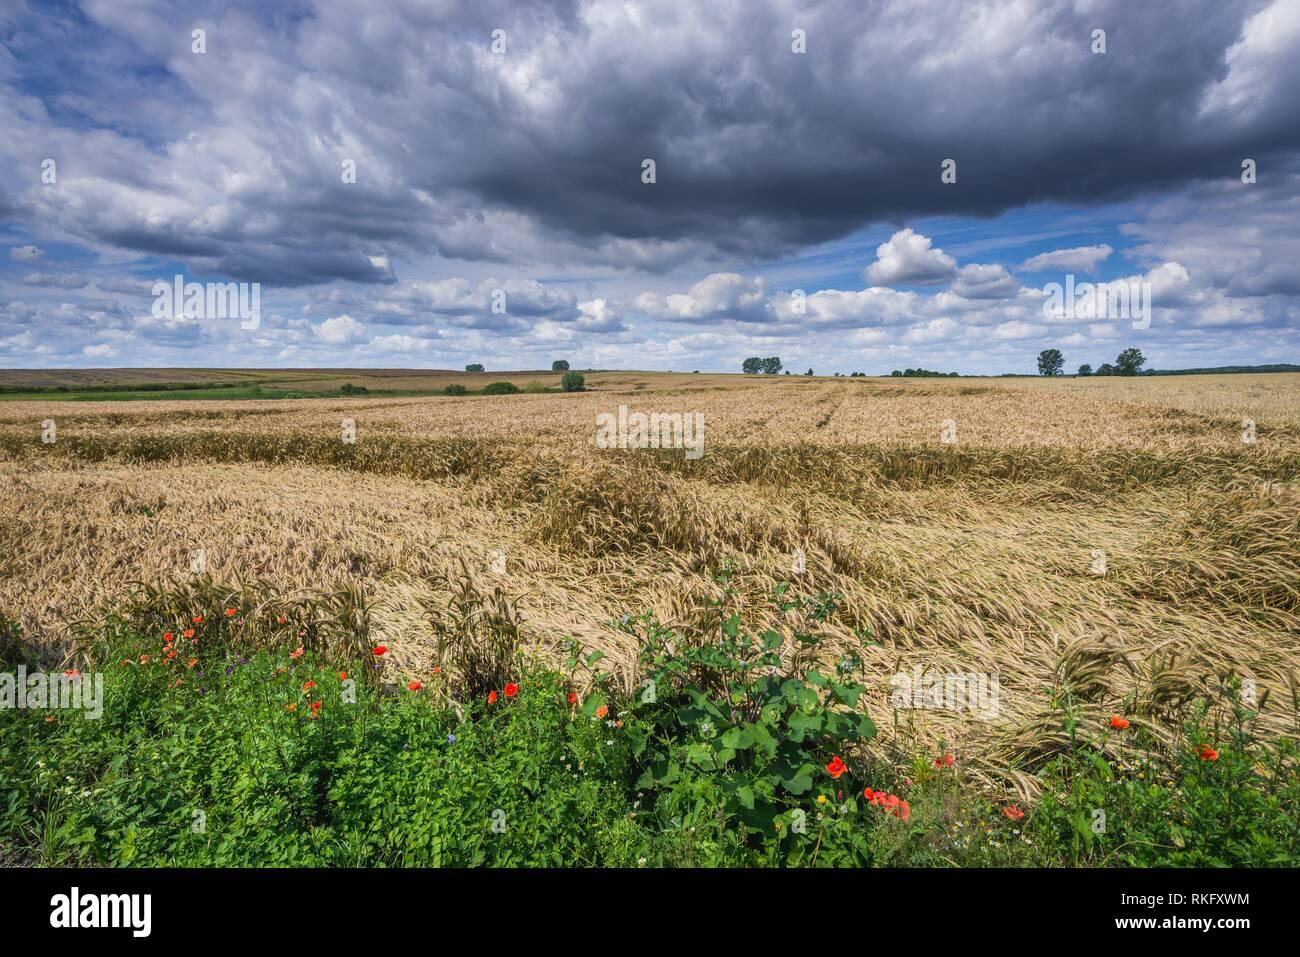 Field in Gryfino County, West Pomeranian Voivodeship in Poland. Stock Photo